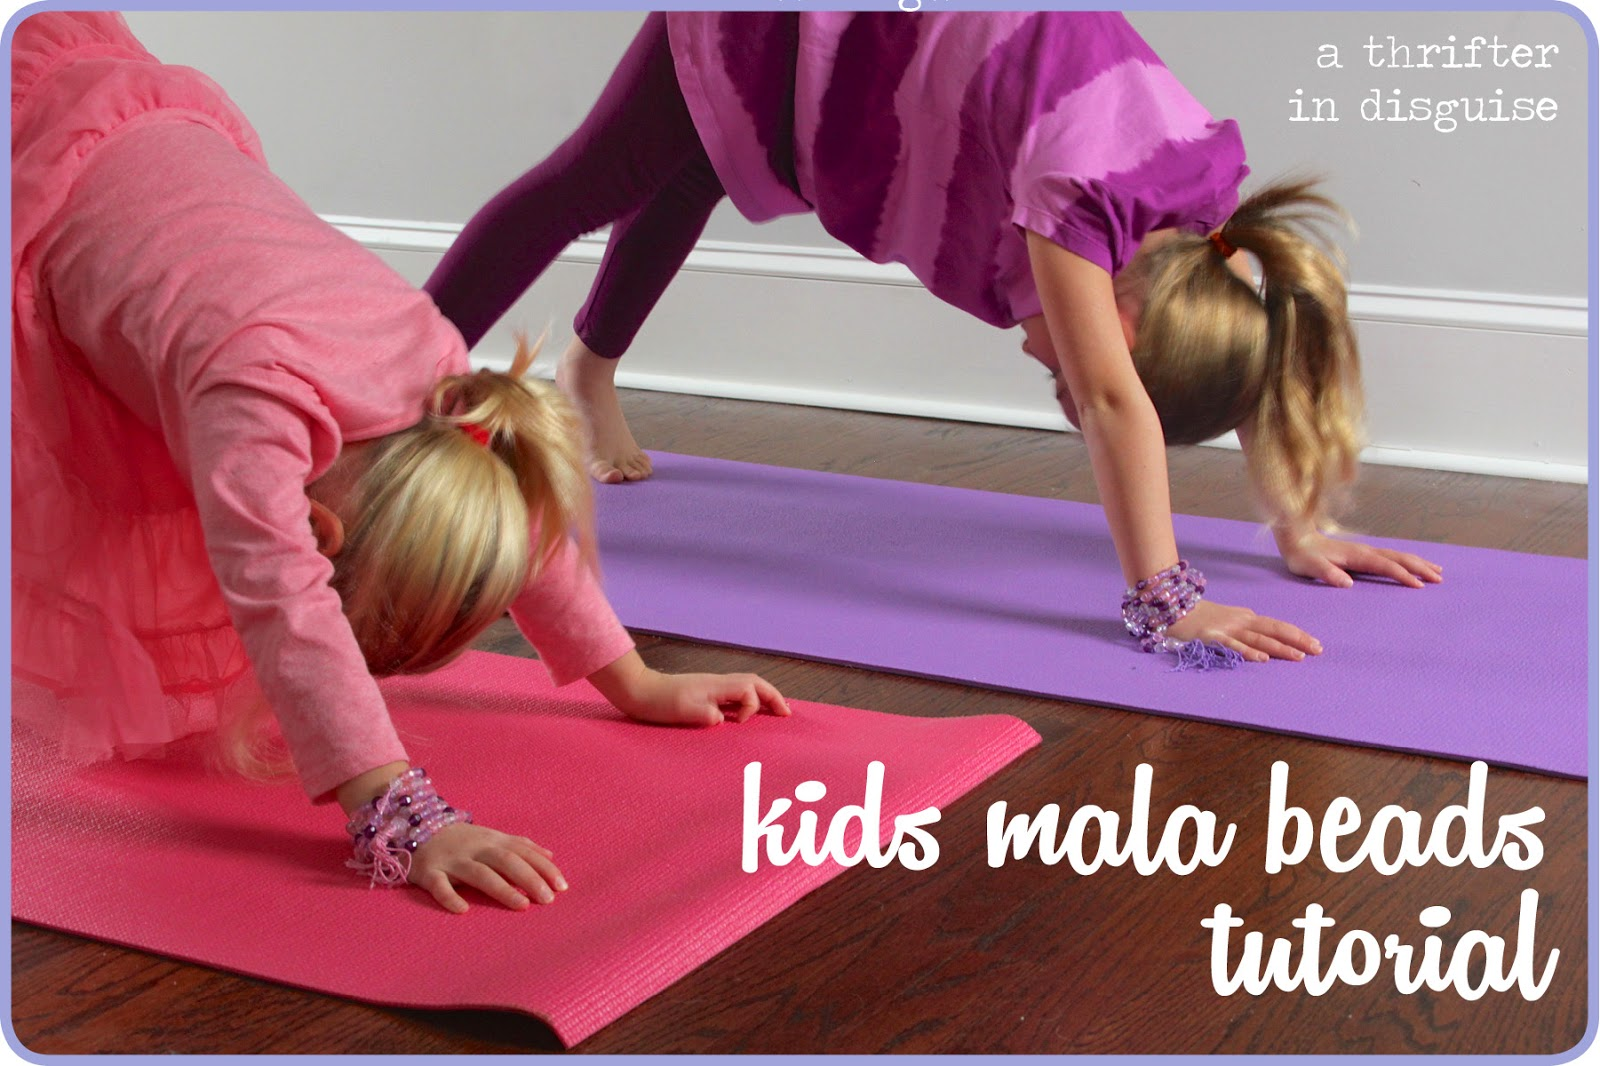 Mala beads for kids